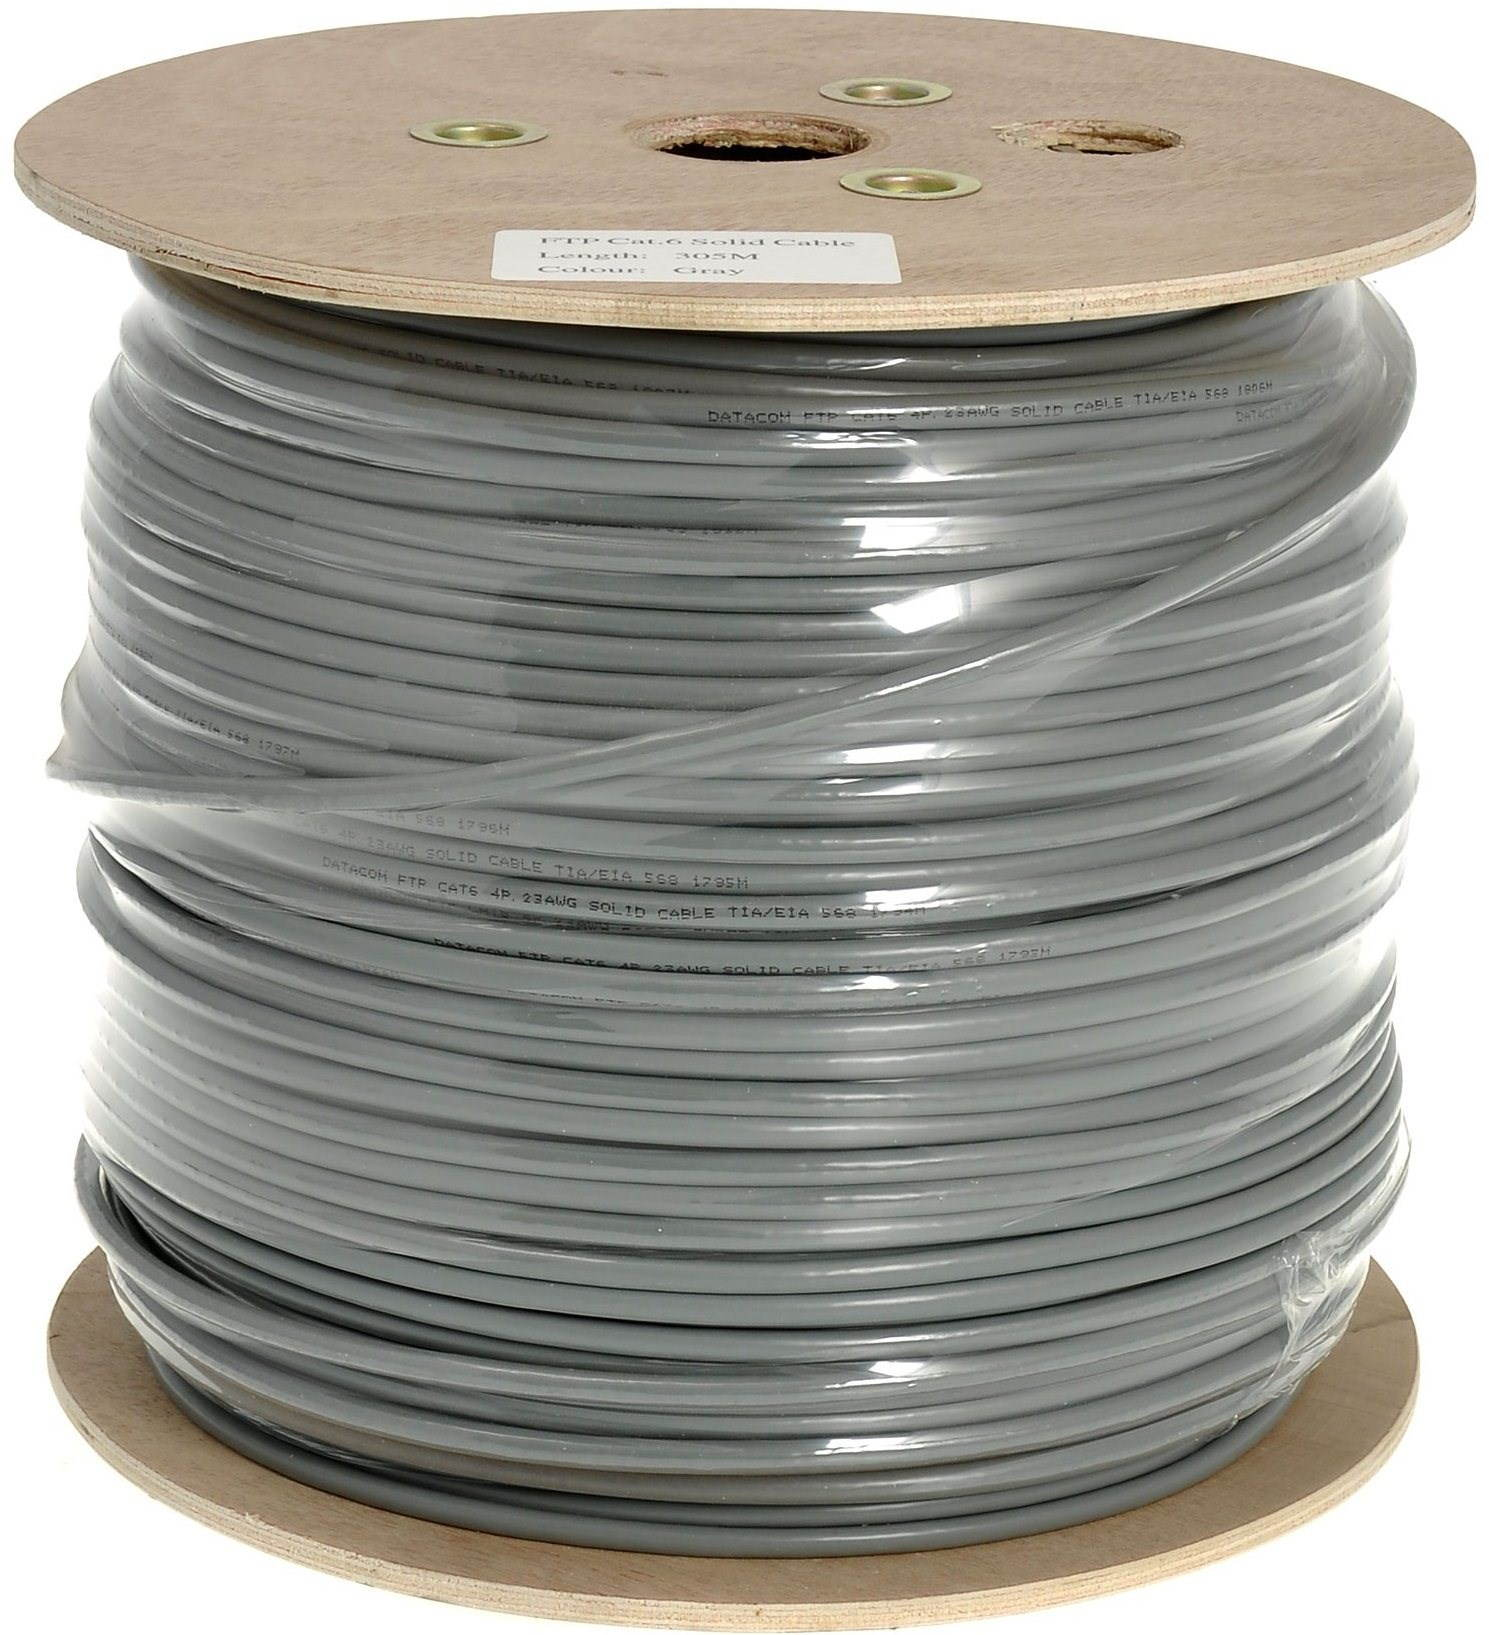 Adatátviteli, Wire, CAT6, FTP, PVC, 500m / tekercs